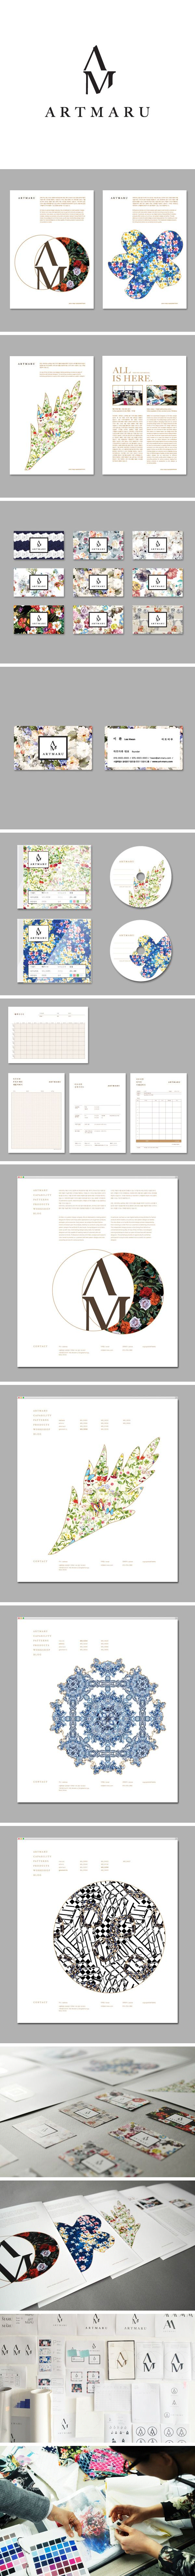 Wv design studio -  Brand Design Of Pattern Design Company Artmaru Www Design Studiospattern Design